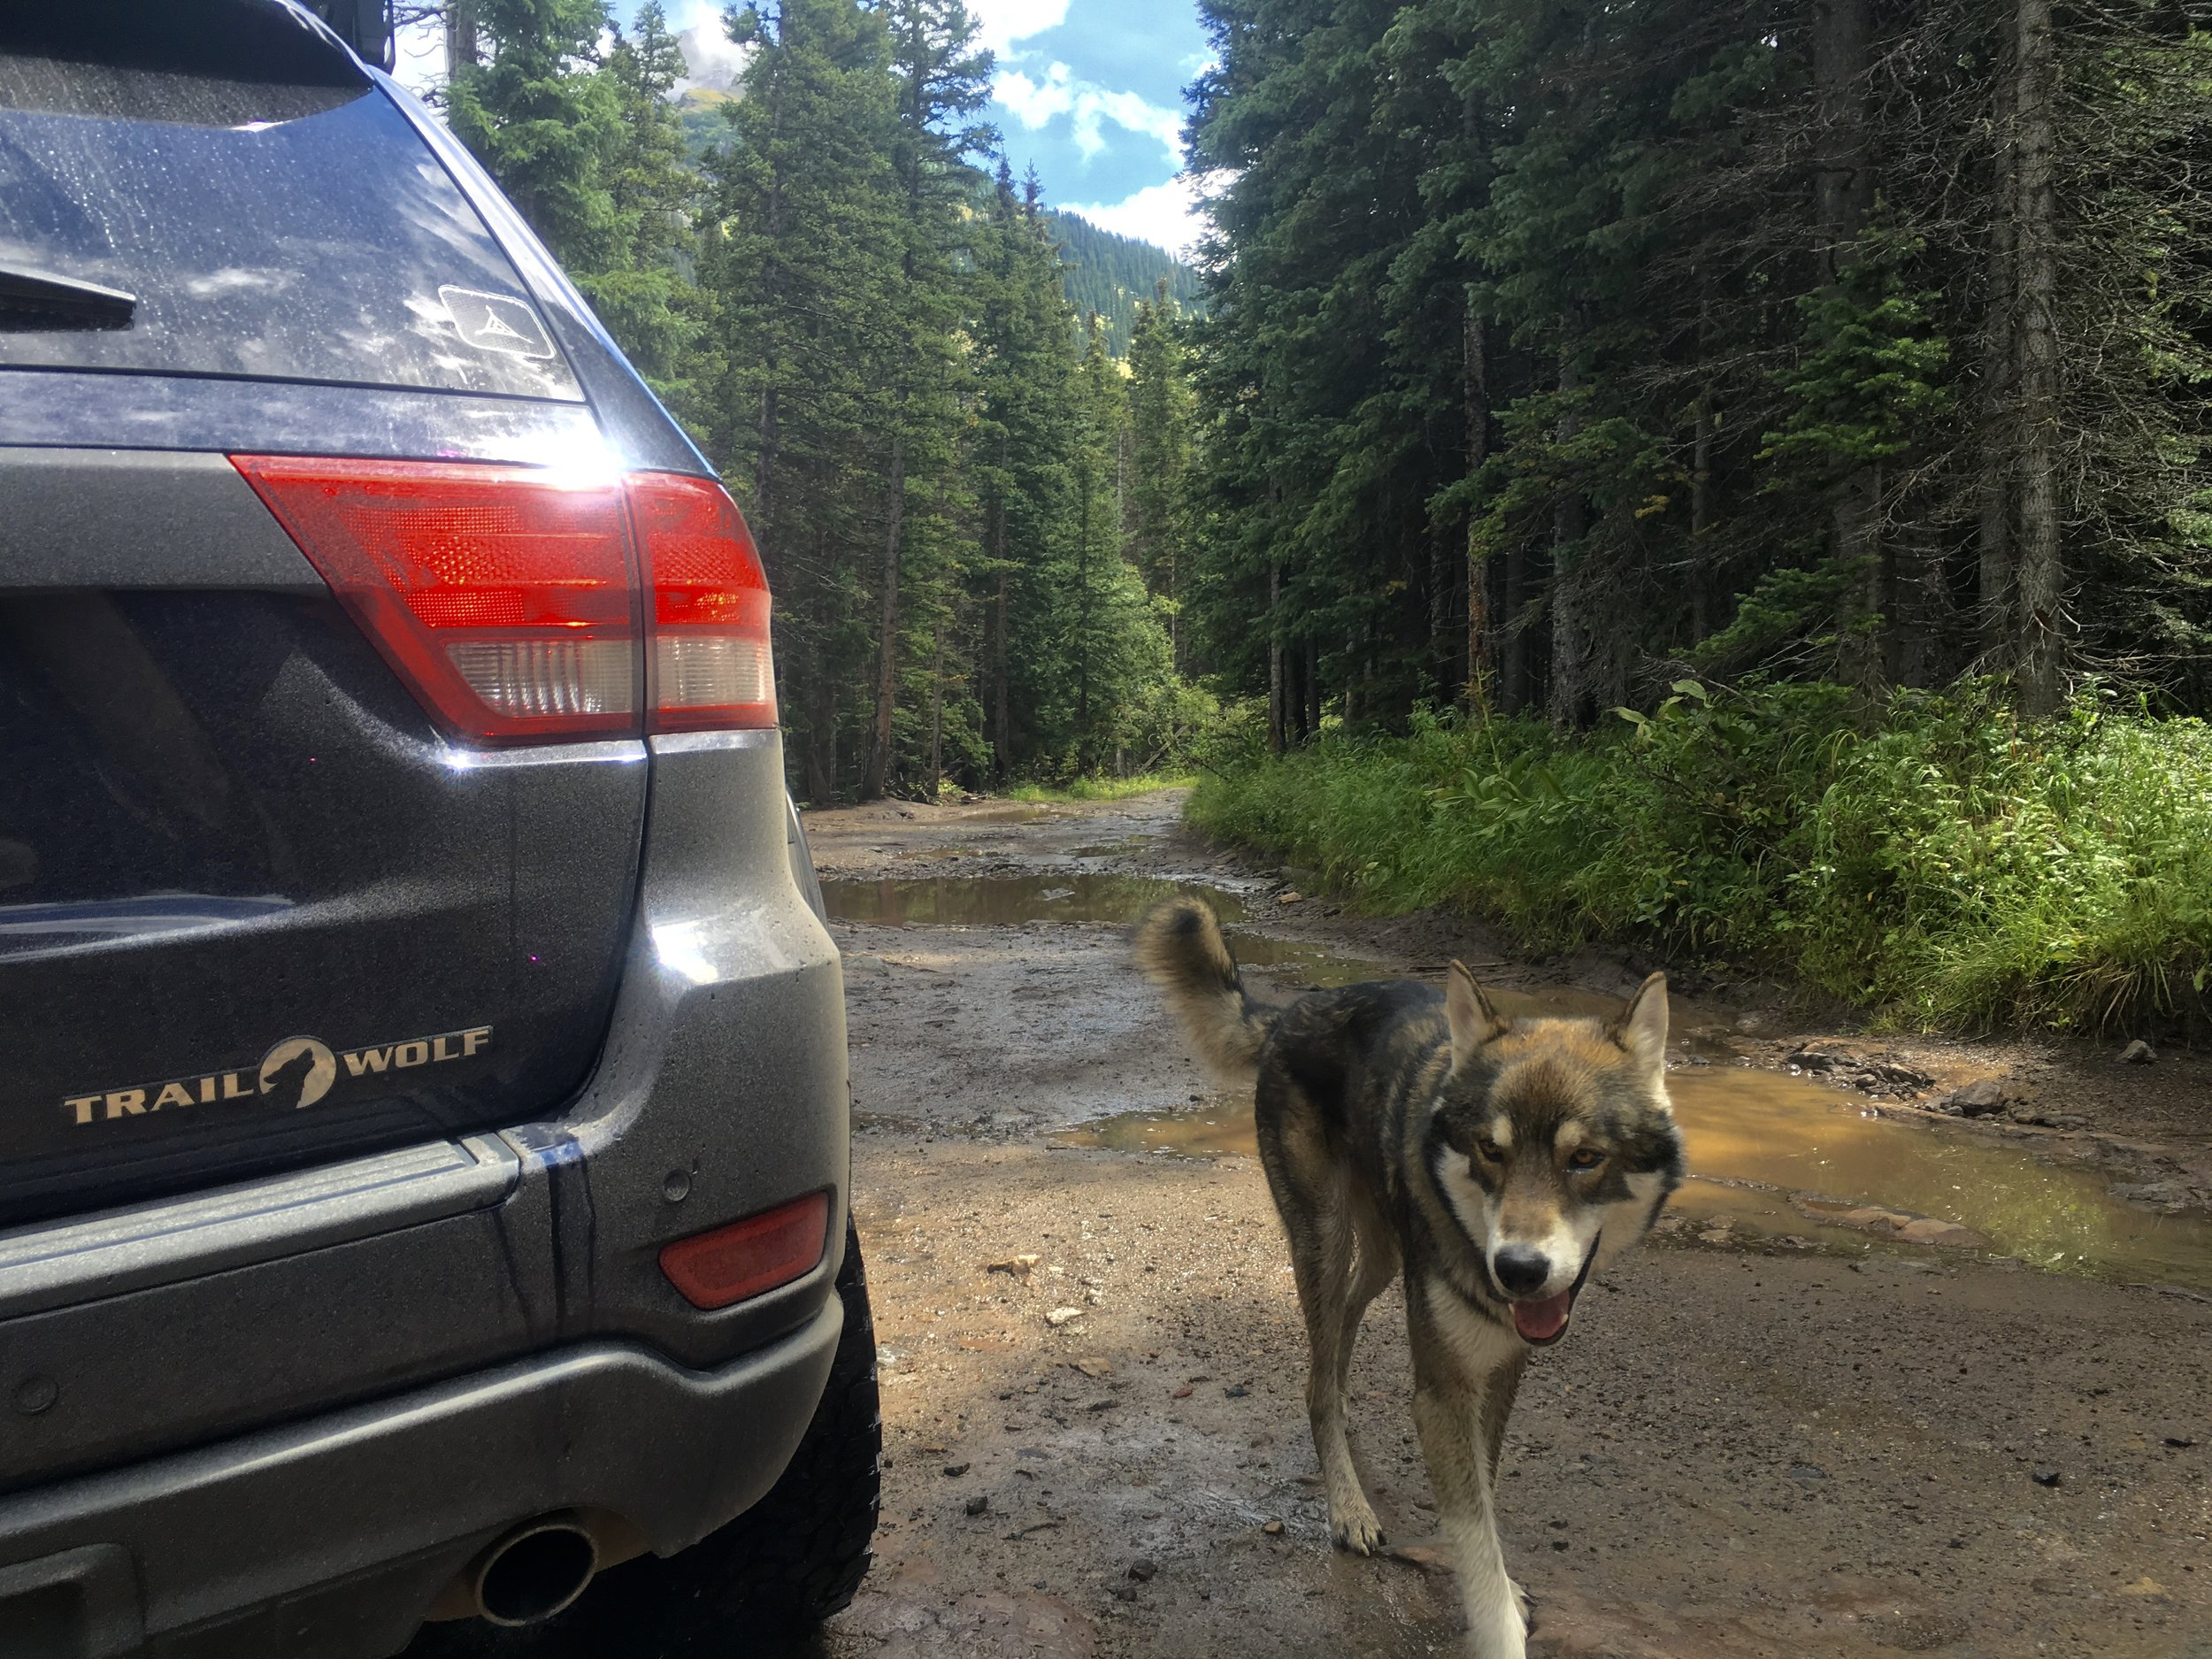 The custom Trail Wolf badge